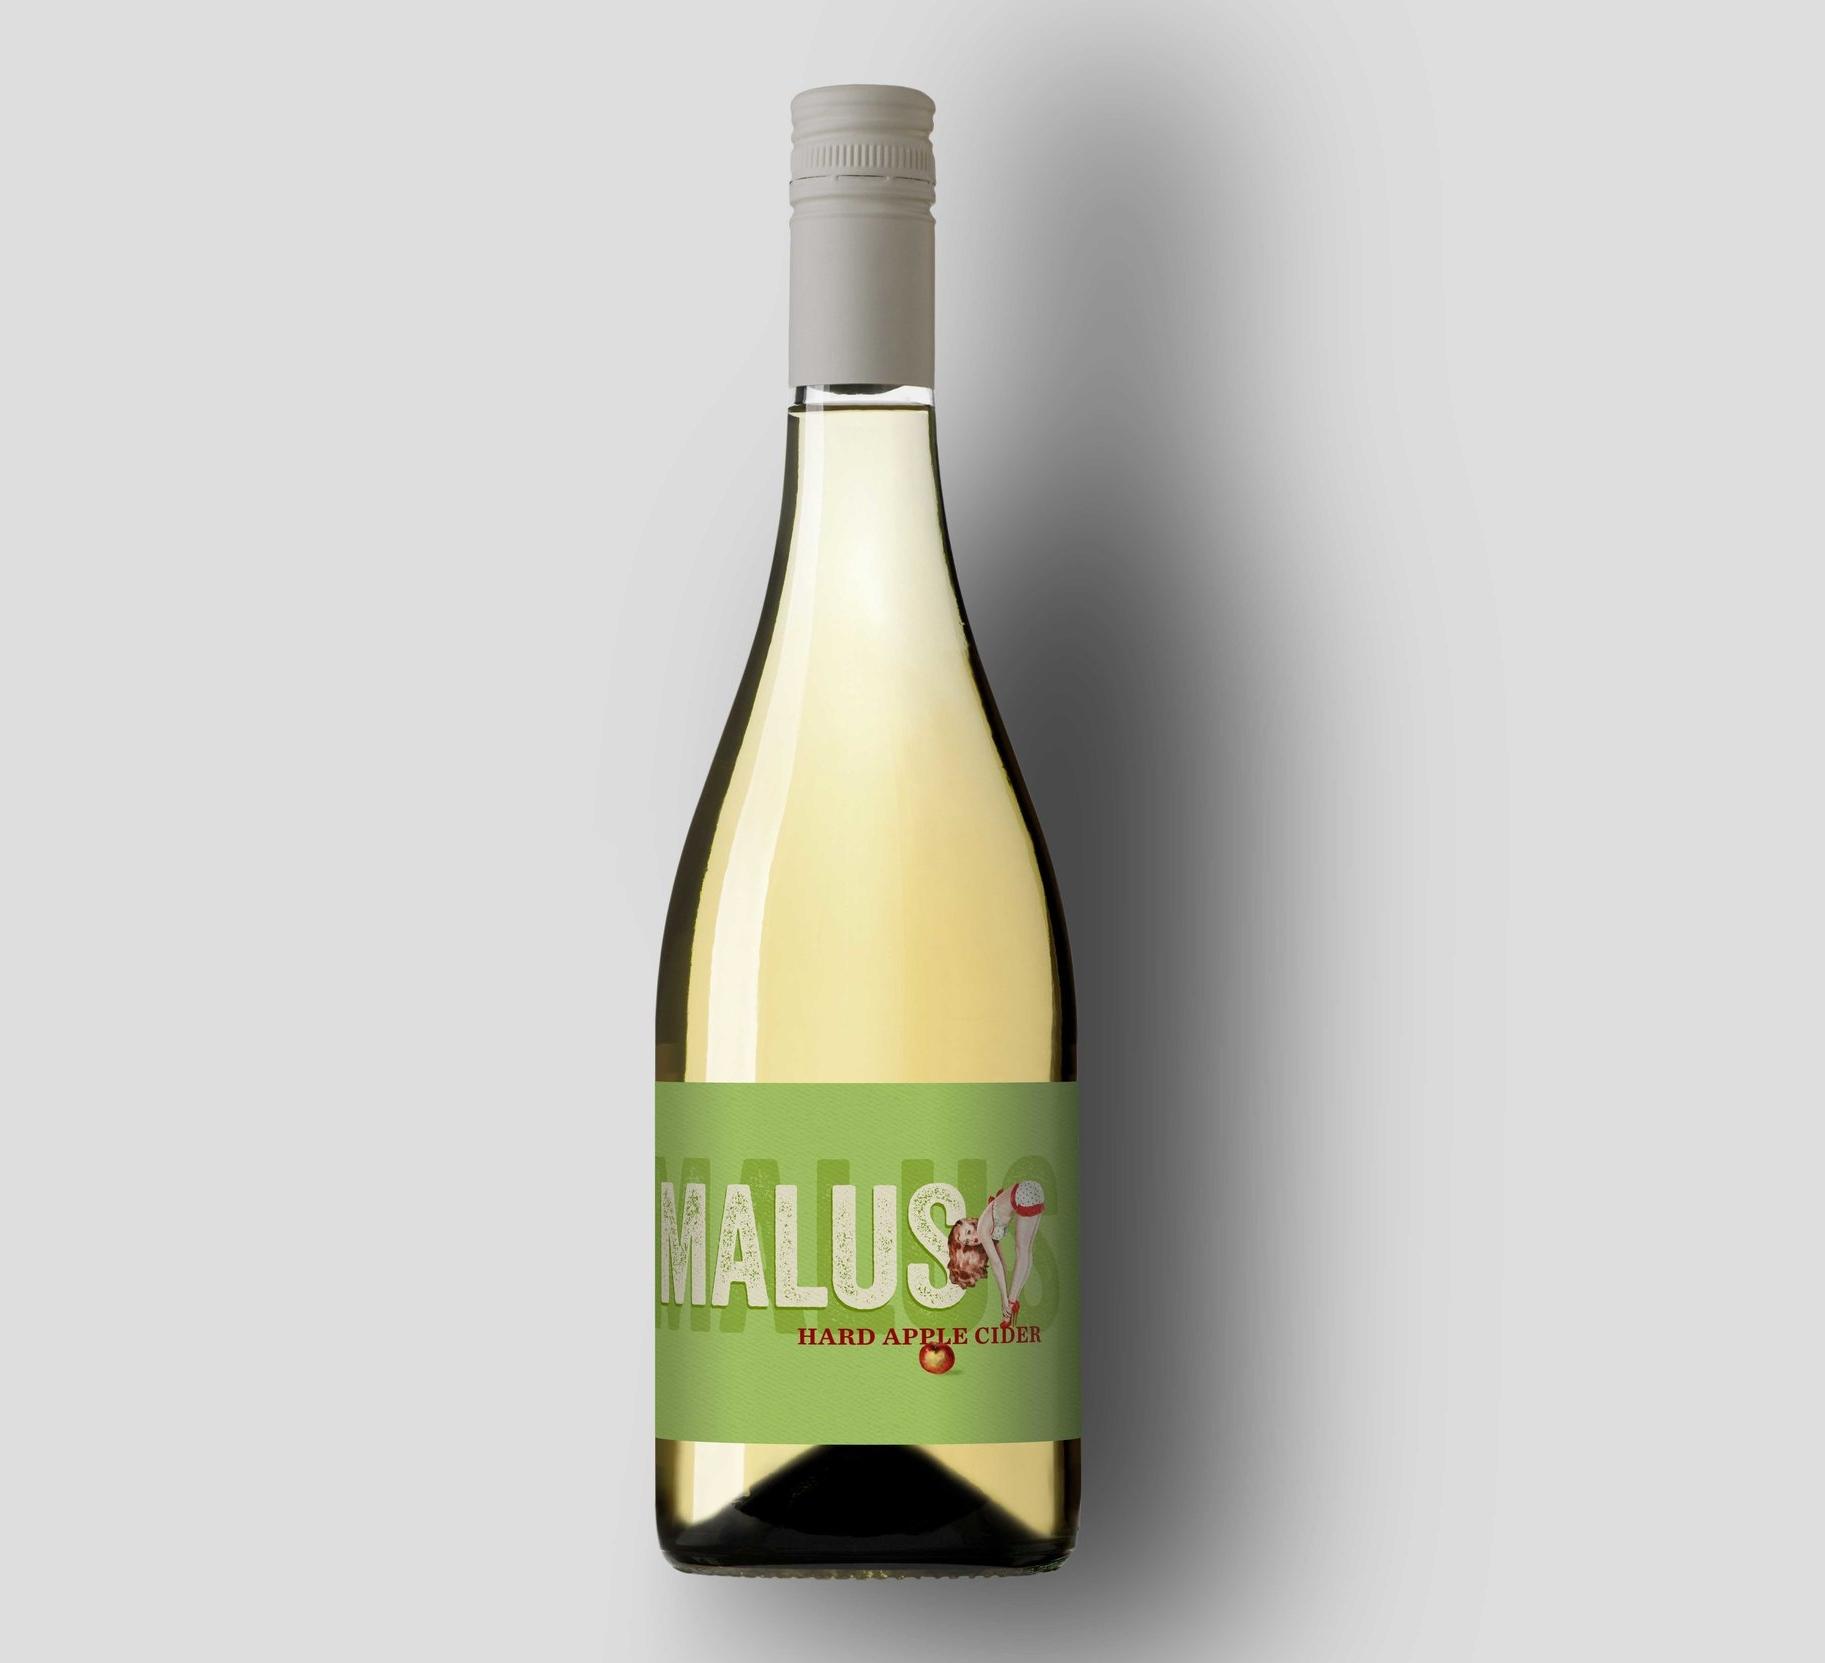 Malus-cider-label.jpg